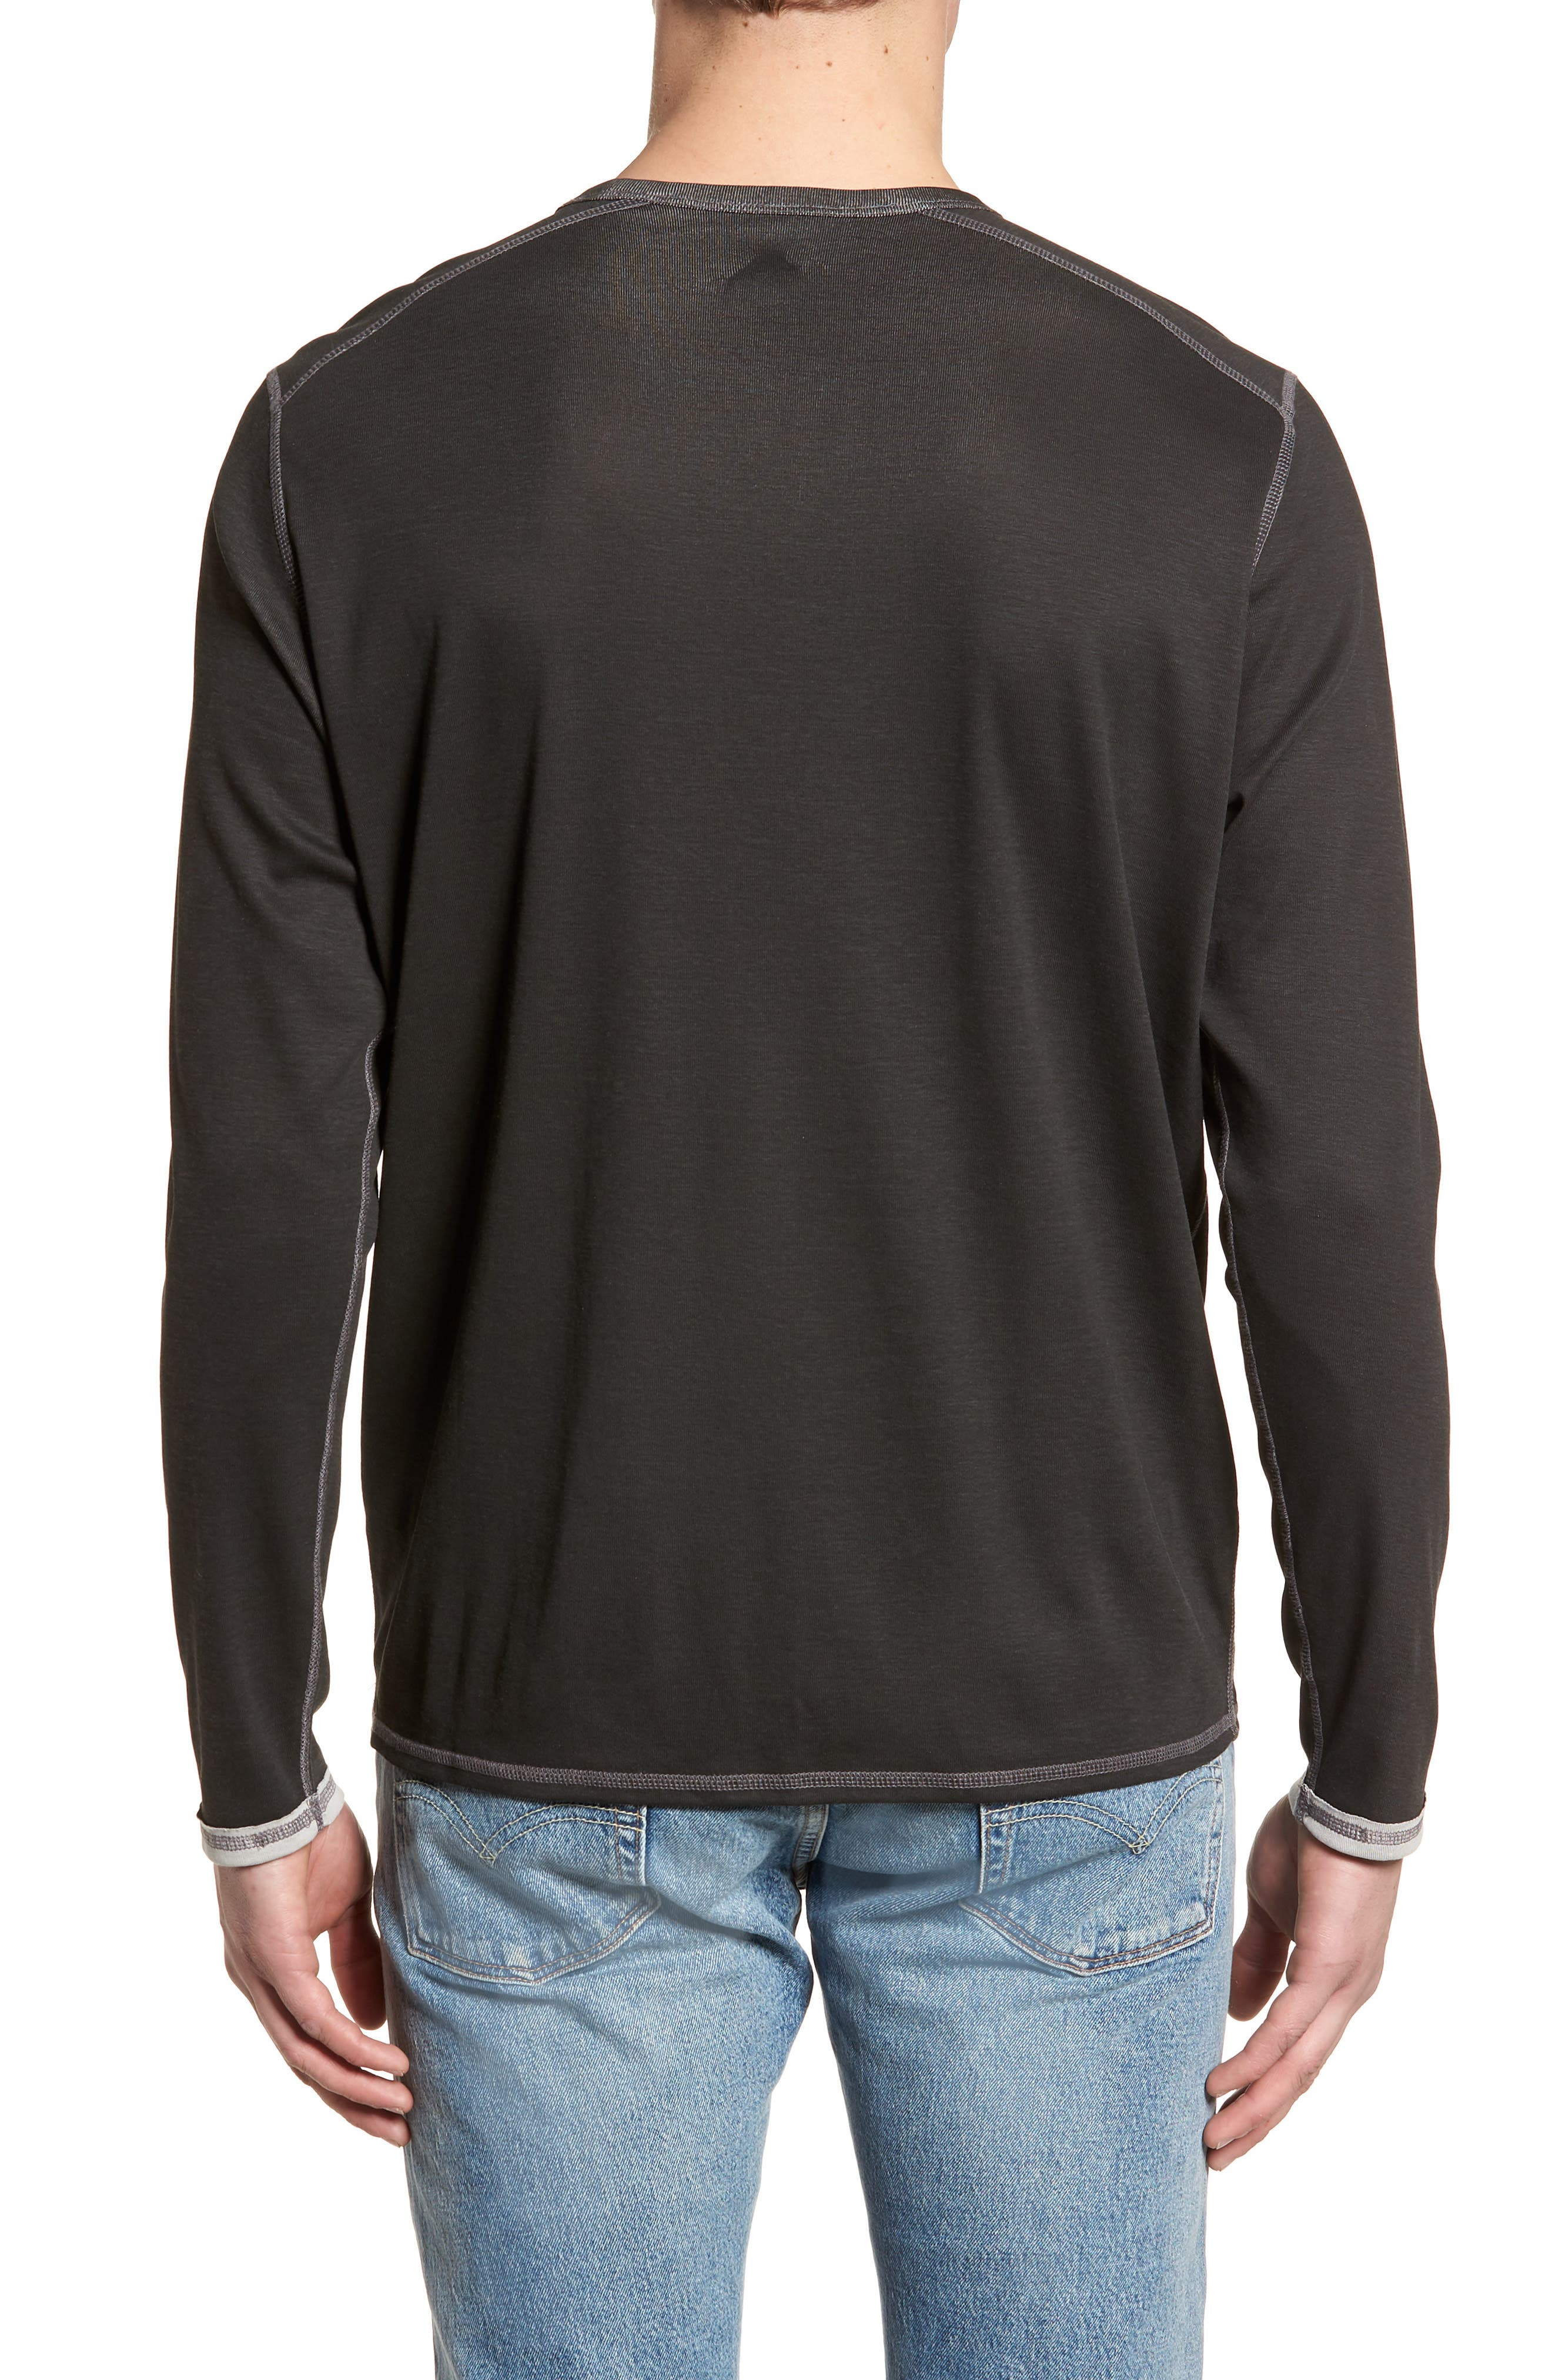 Dual in the Sun Reversible T-Shirt,                             Alternate thumbnail 3, color,                             001